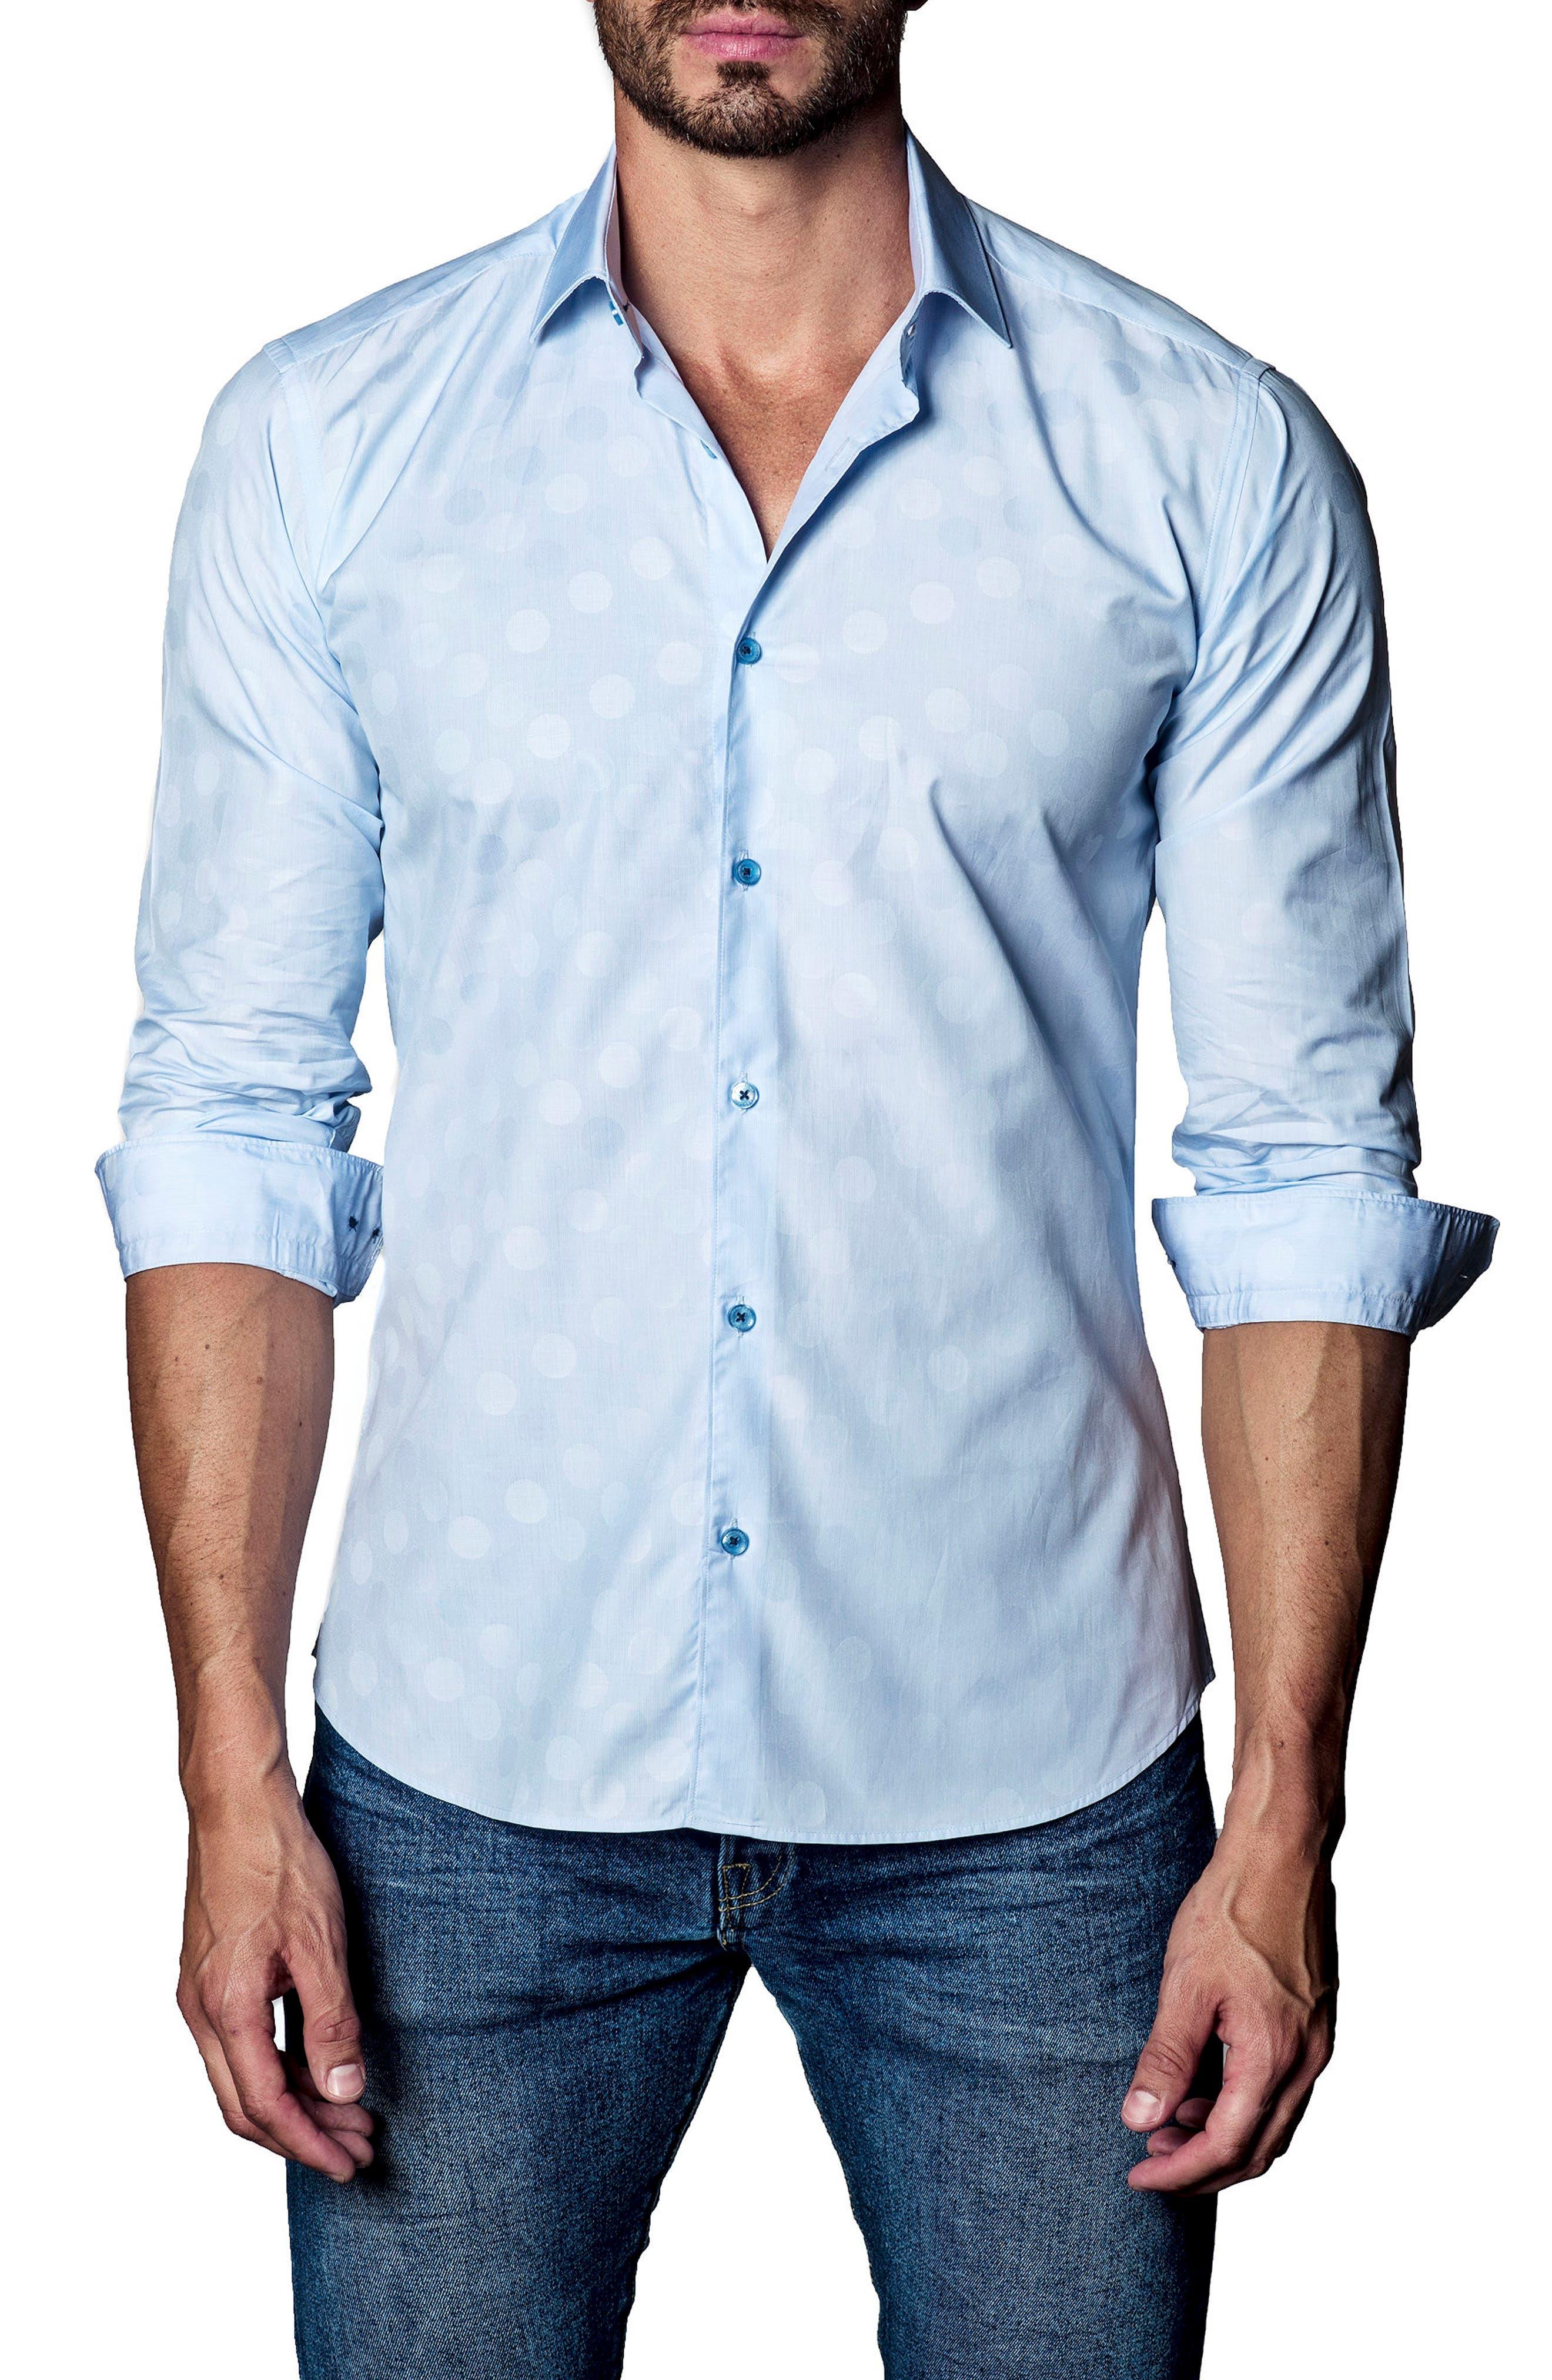 Dot Print Sport Shirt,                         Main,                         color, Light Blue Polka Dot Jacquard